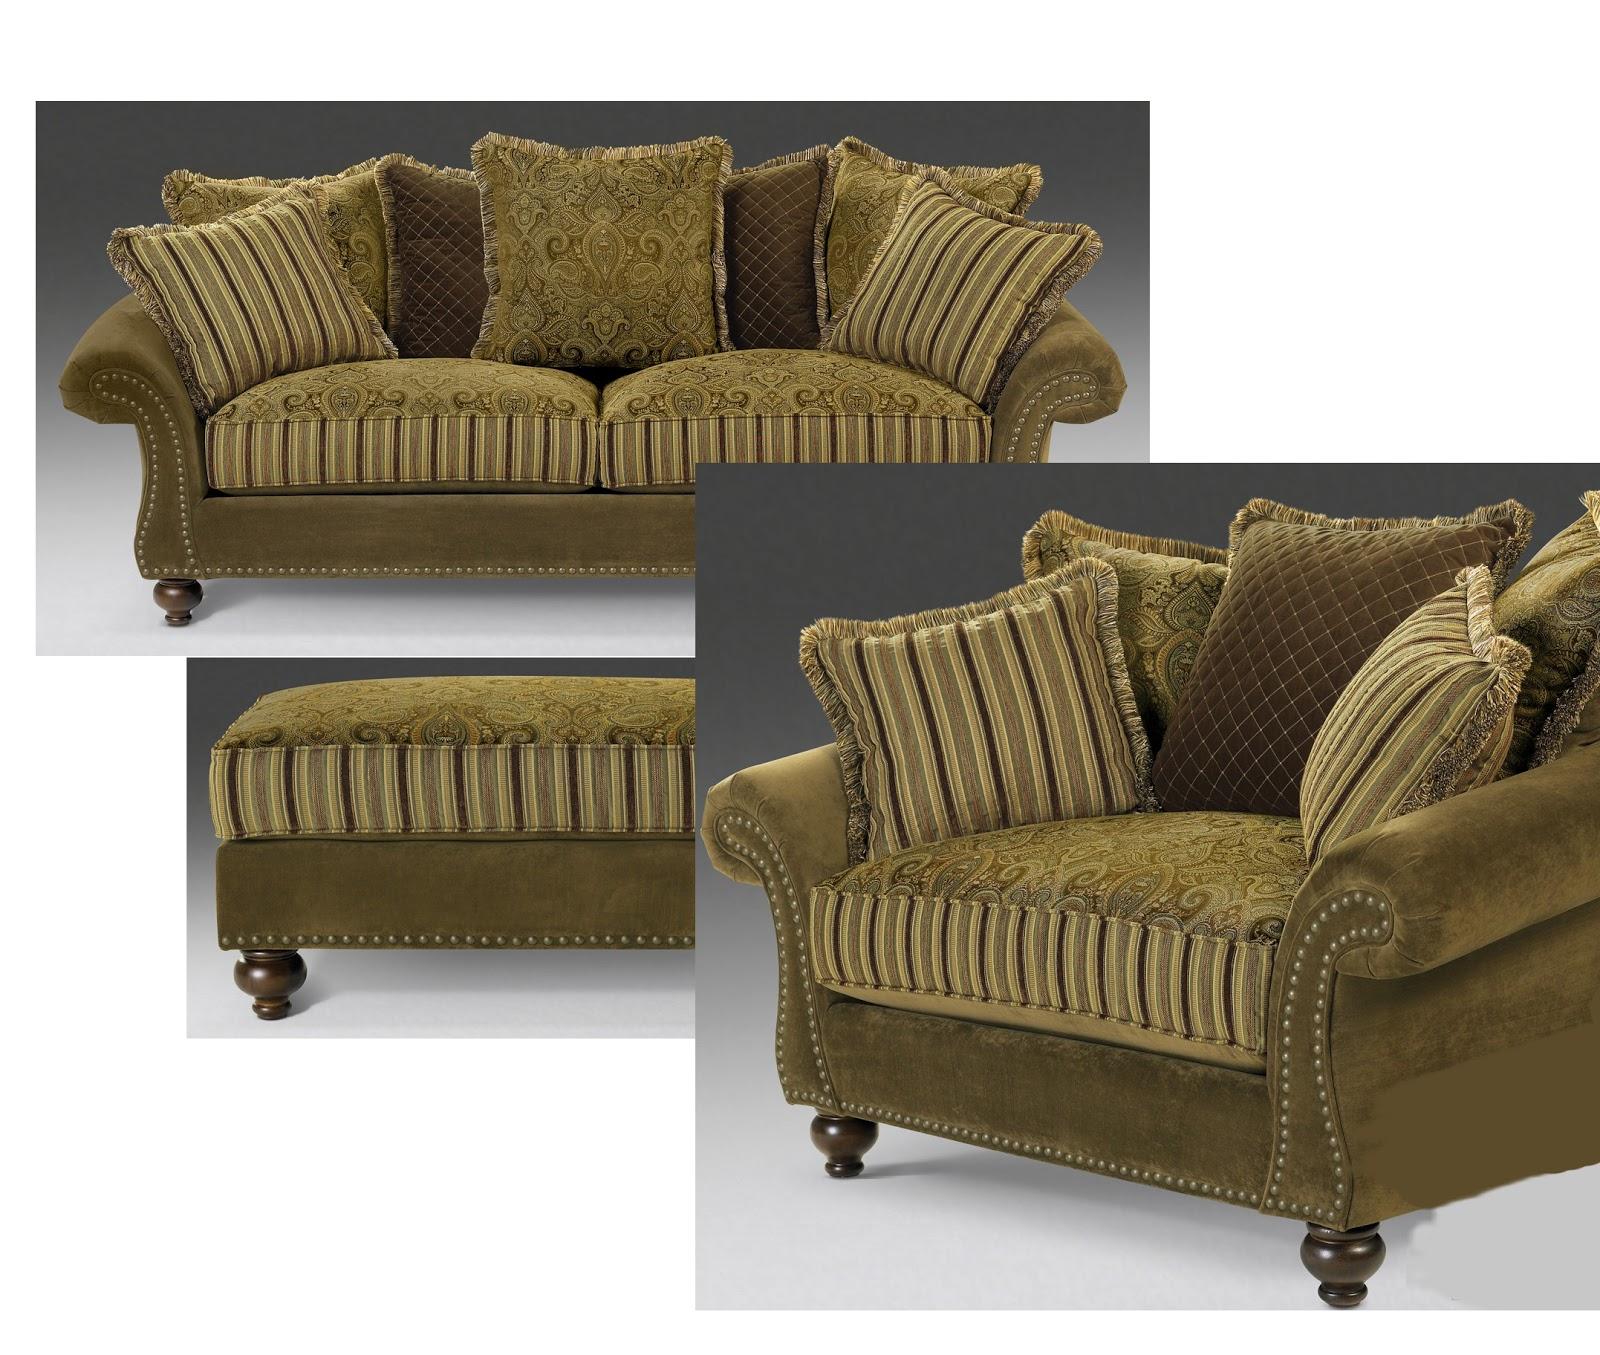 Cindy Crawford Bedroom Furniture